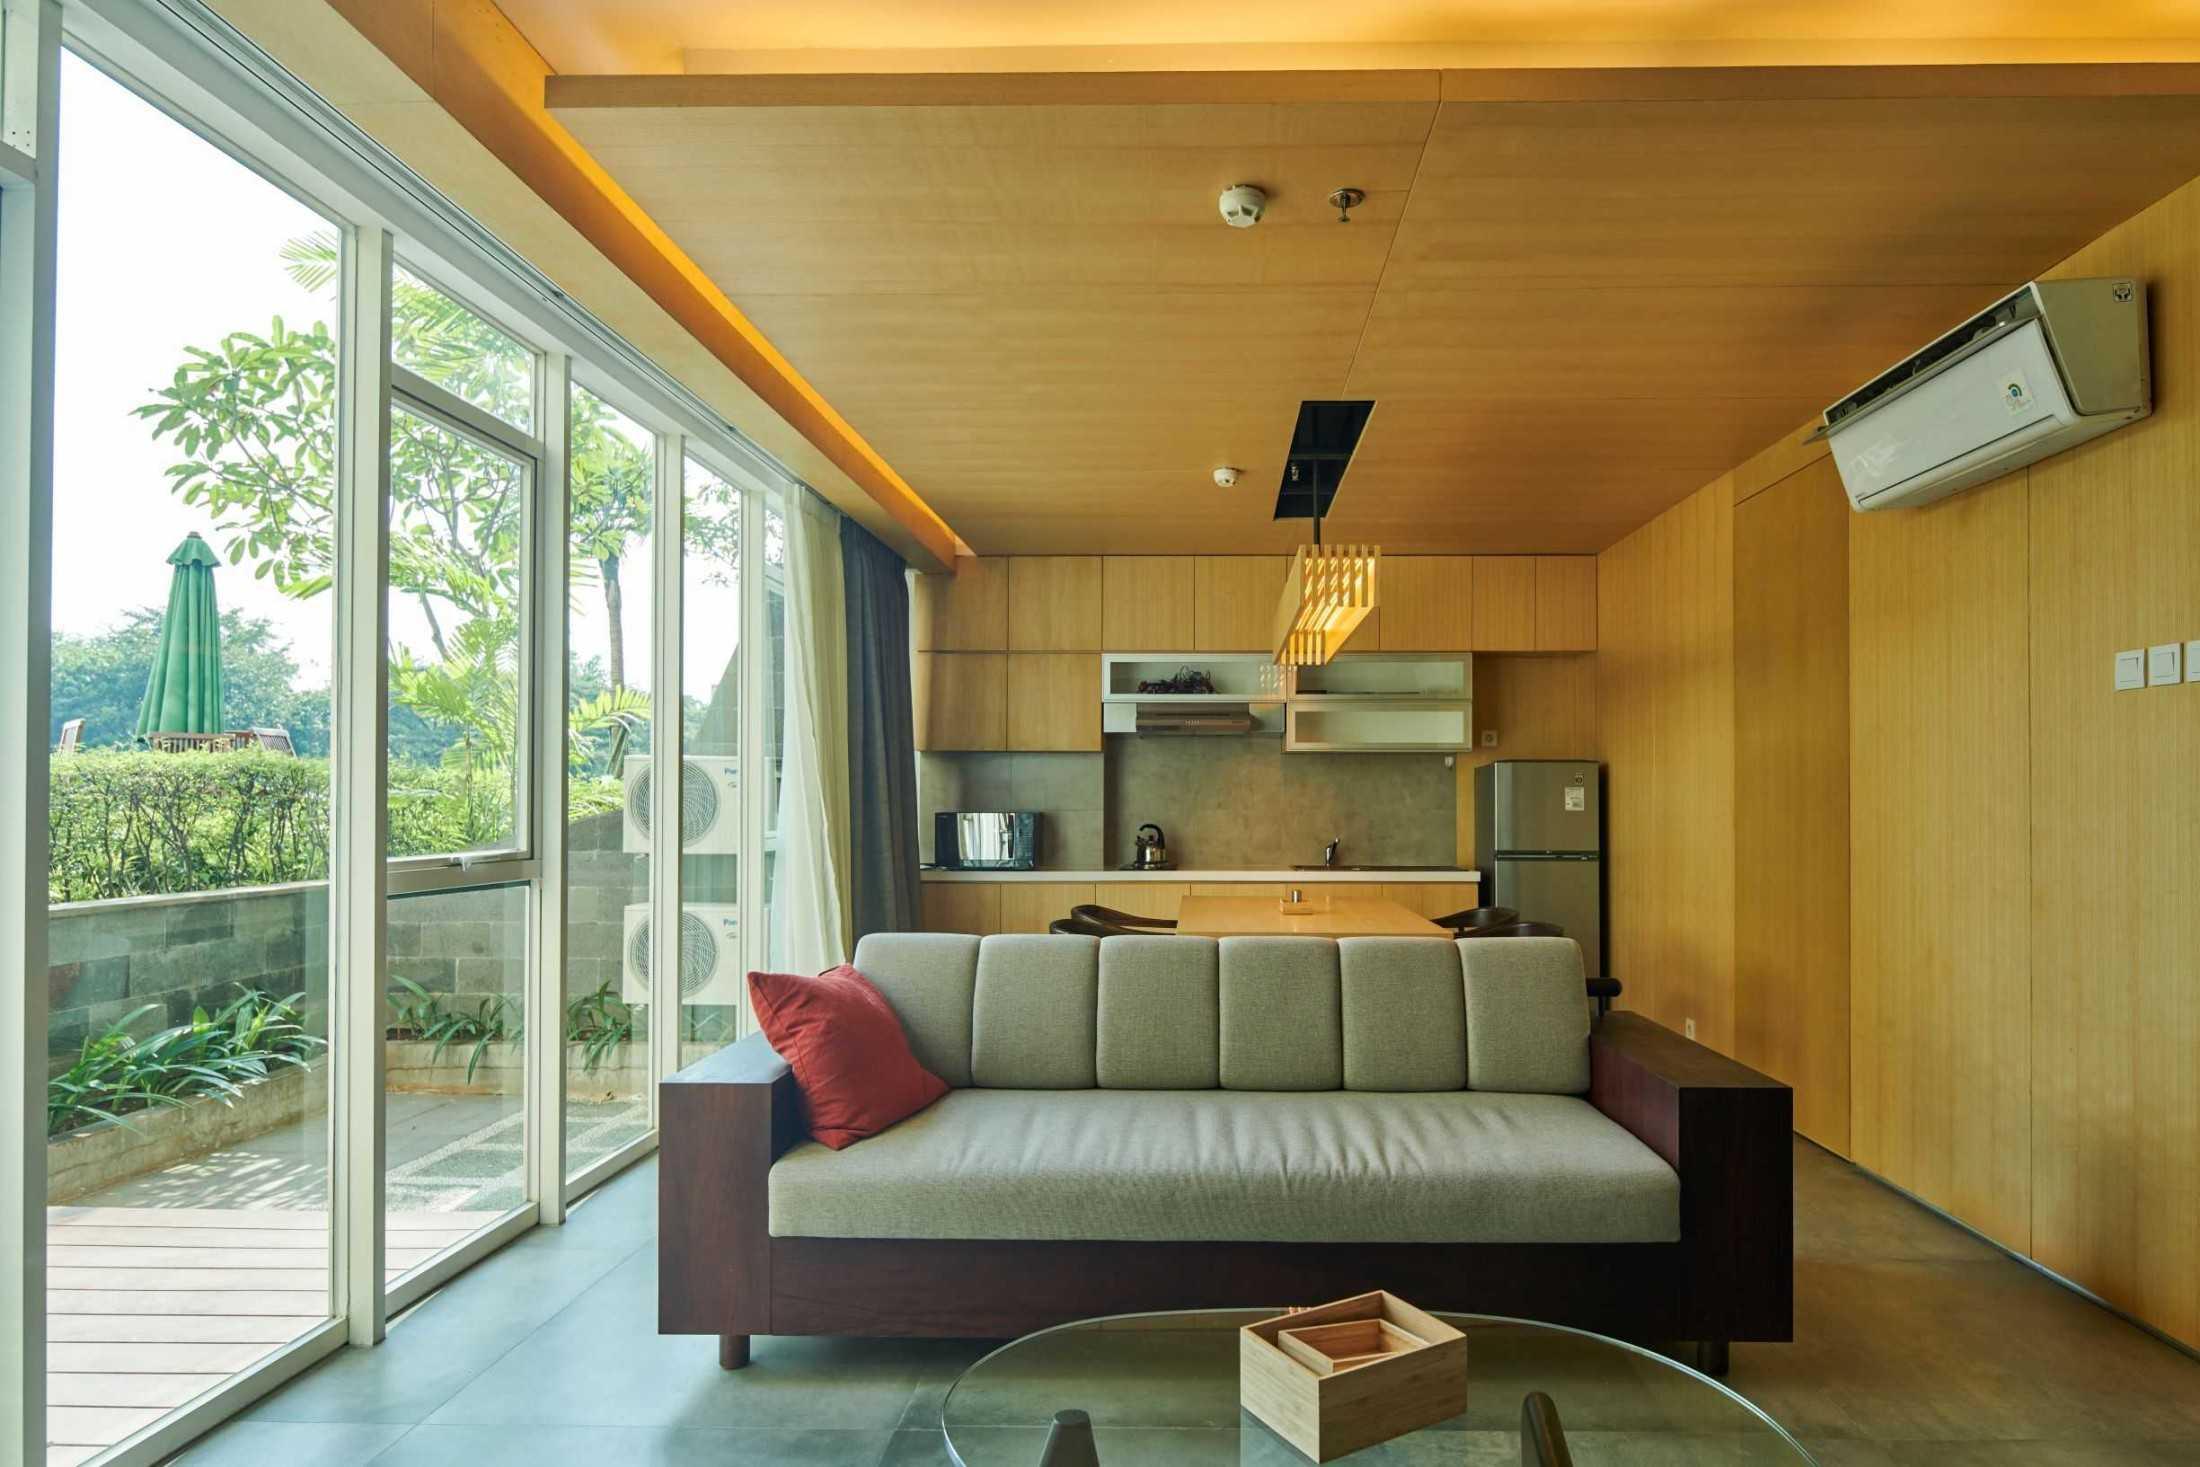 Hadivincent Architects Tb Apartment Lippo Cikarang, Bekasi, Jawa Barat, Indonesia Lippo Cikarang, Bekasi, Jawa Barat, Indonesia Hadi-Vincent-Architects-Tb-Apartment  70996